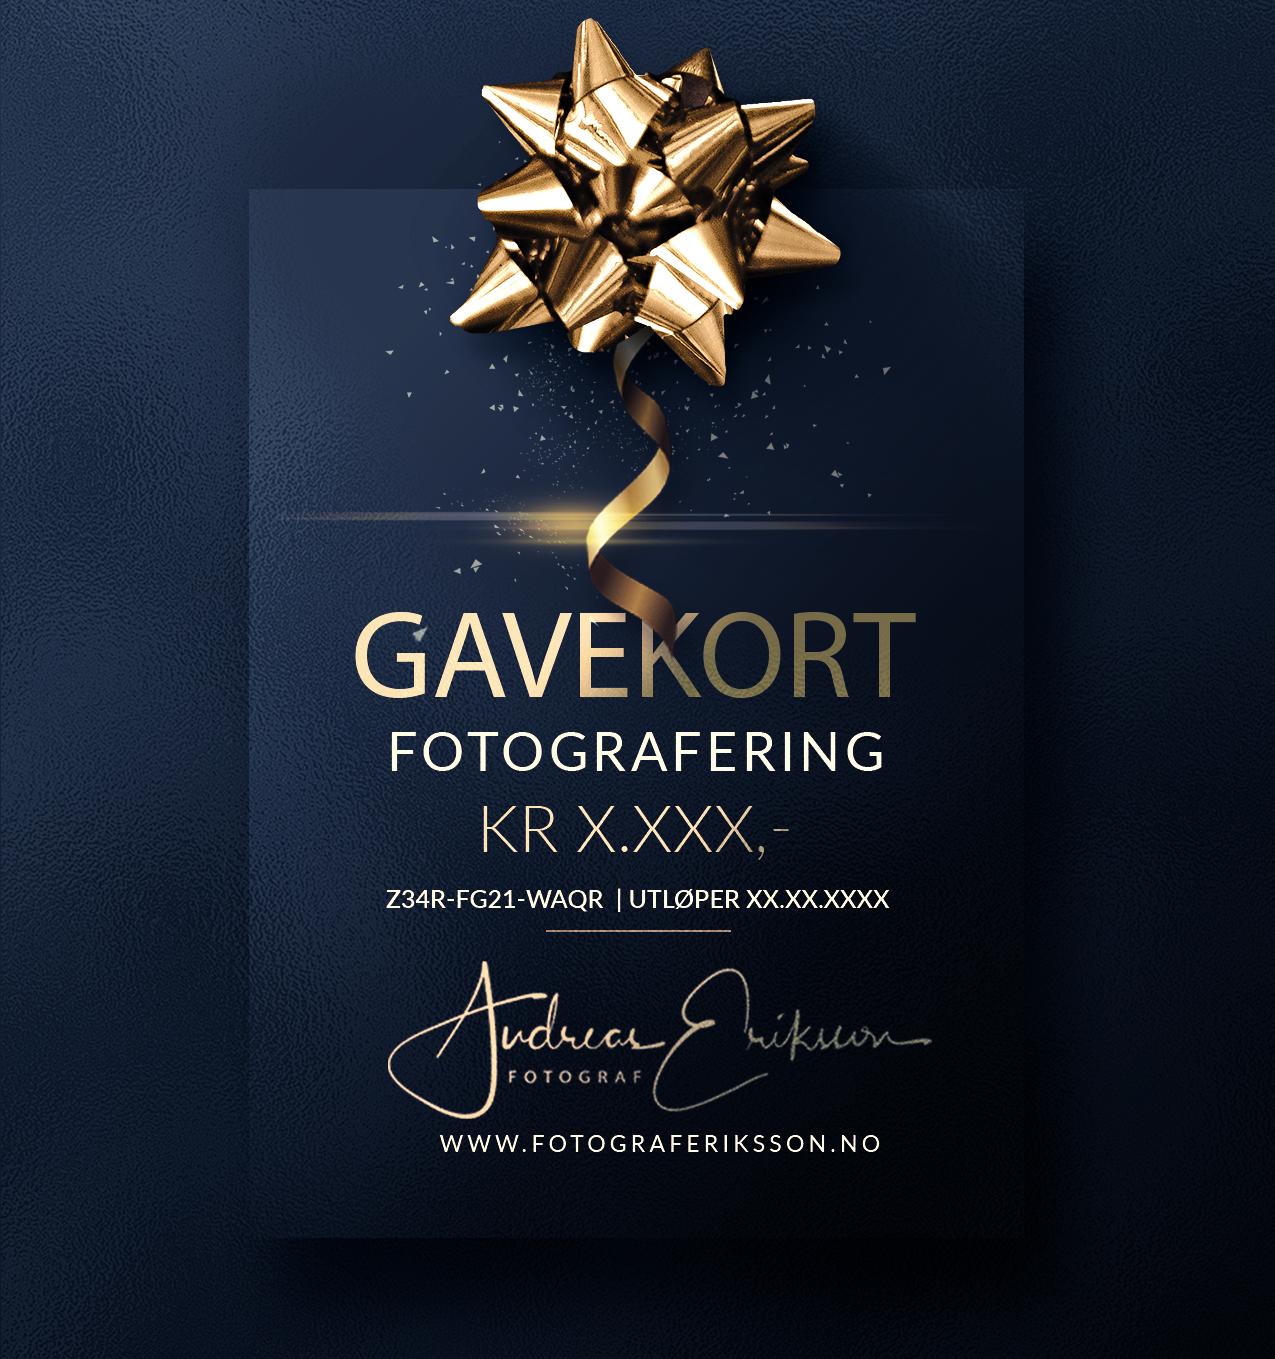 NYHET: Nå kan du bestille gavekort